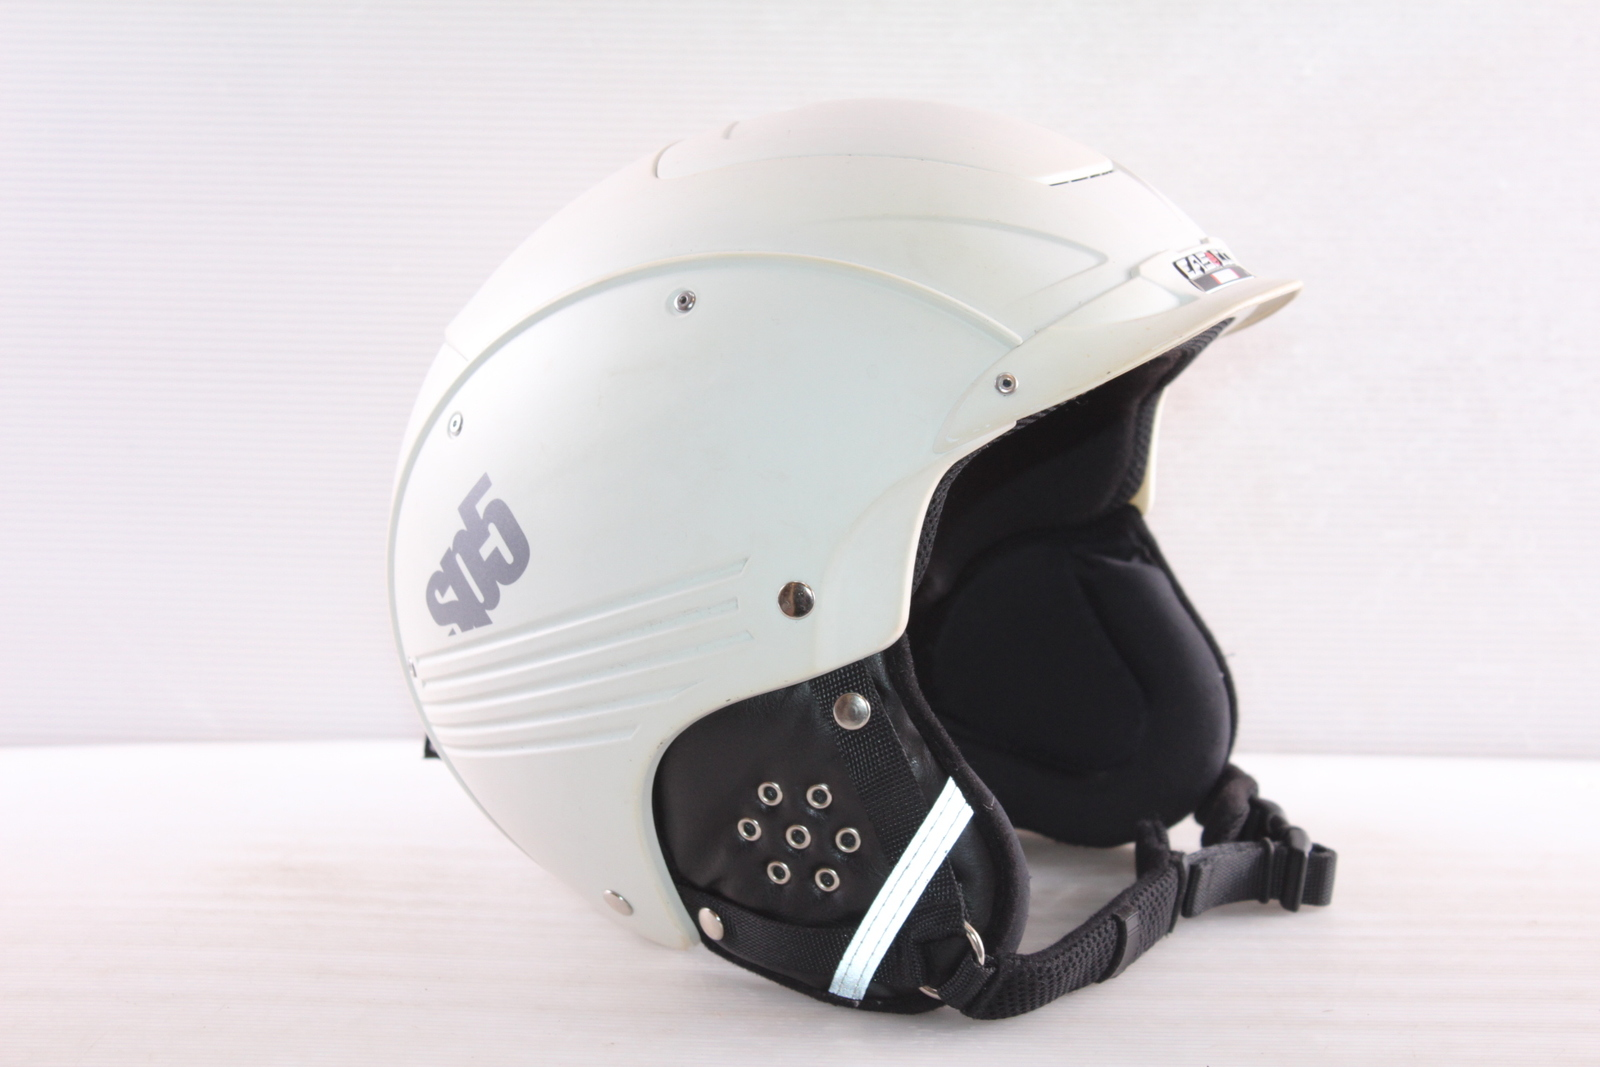 Dámská lyžařská helma Casco SP 5 - posuvná vel. 58 - 62